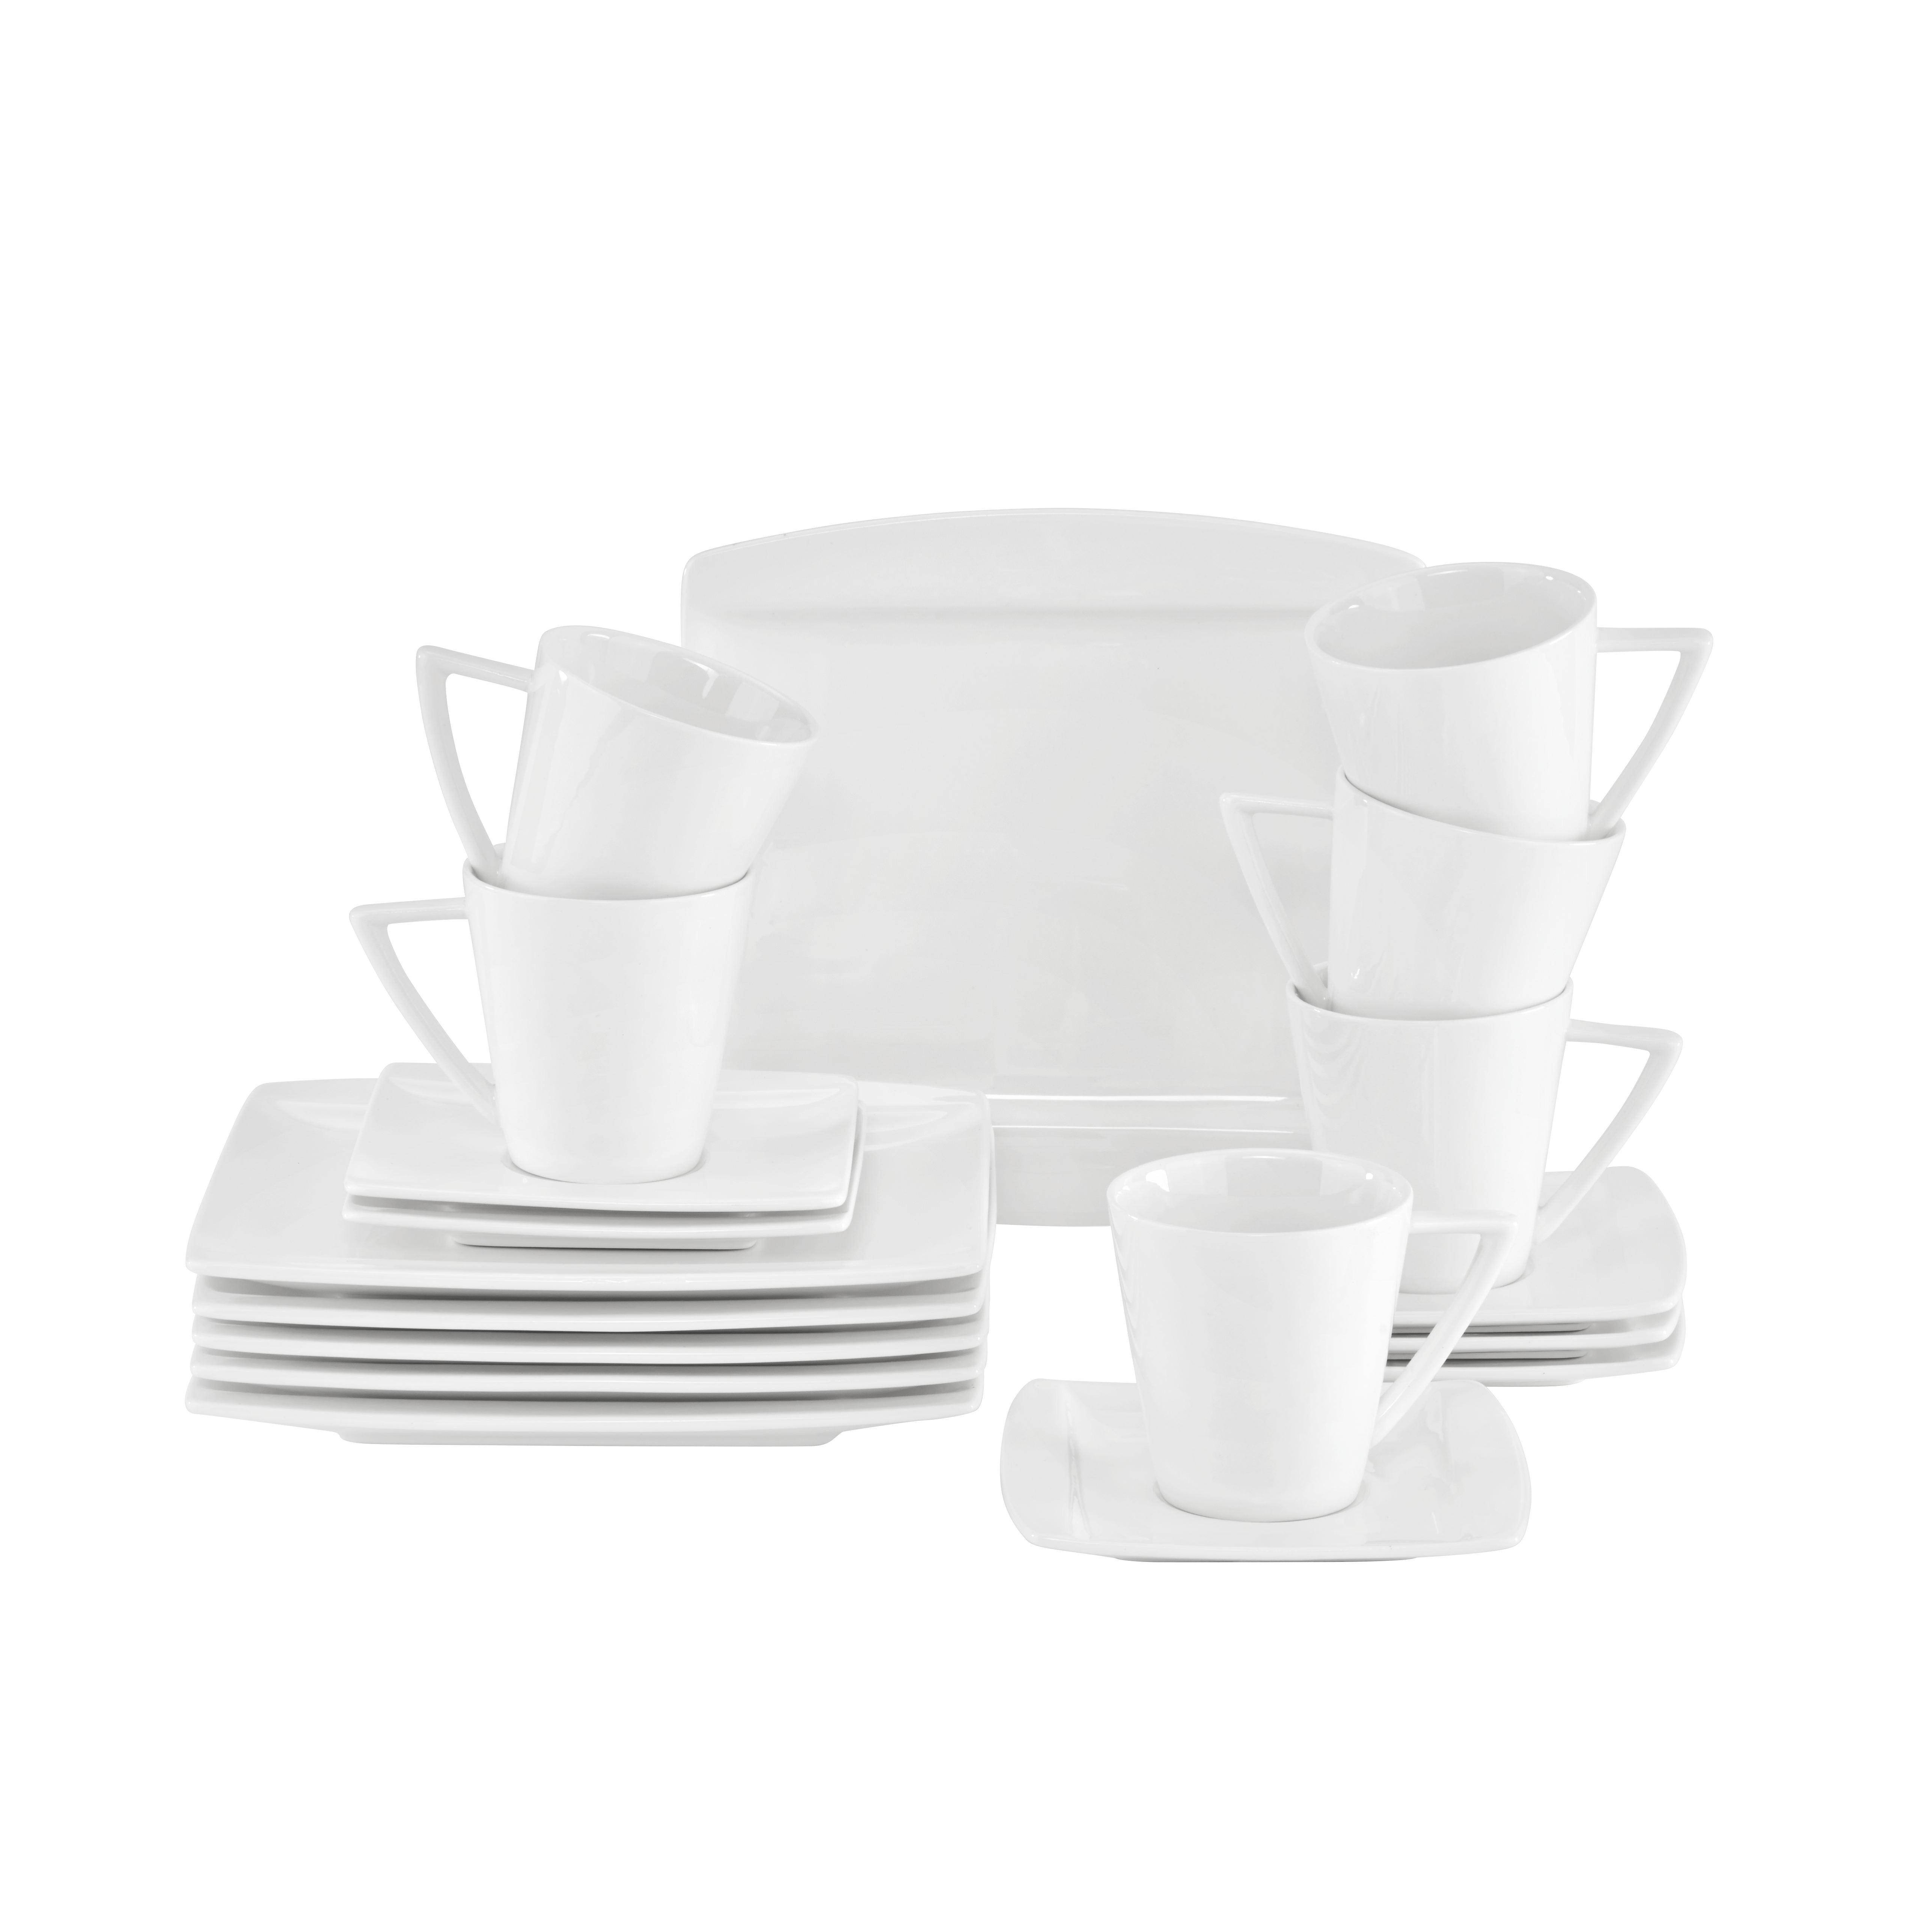 Skodelica Za Espreso Pura - bela, Trendi, keramika (0,75cm) - MÖMAX modern living